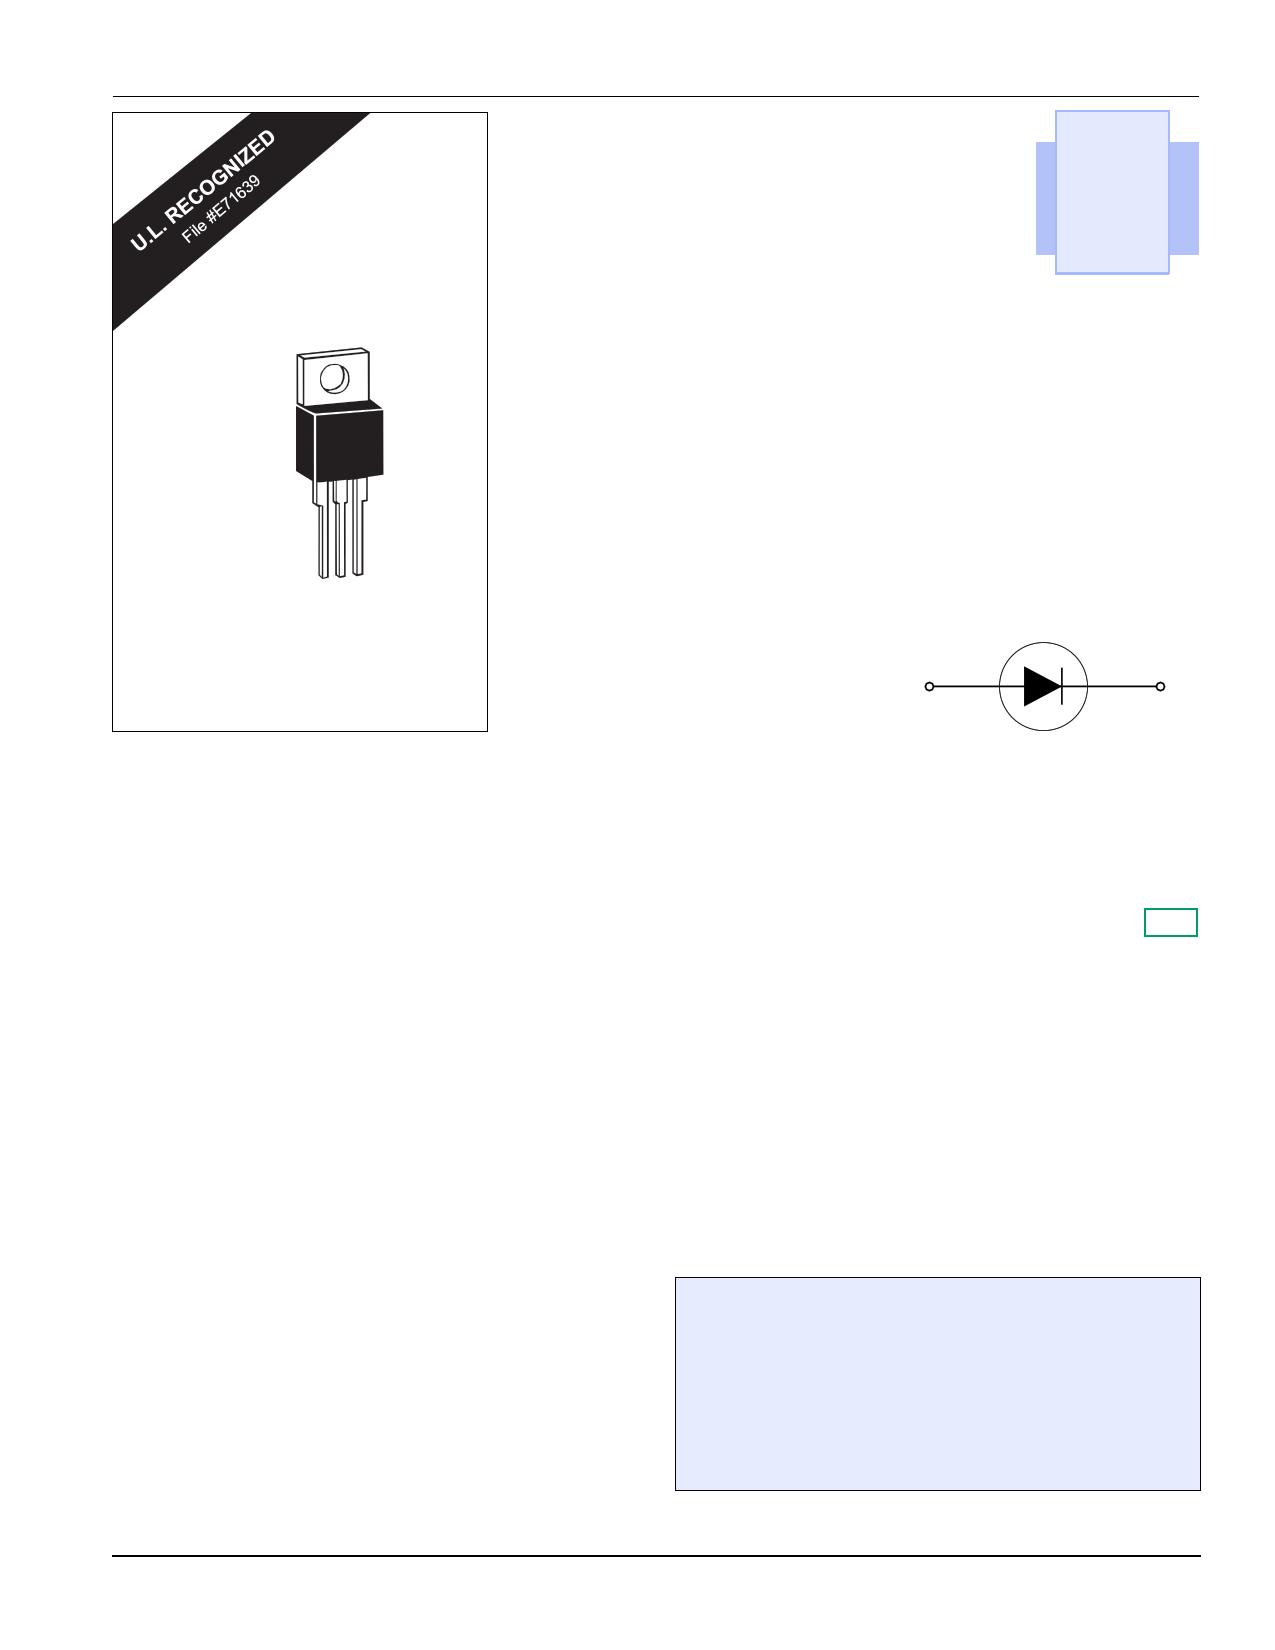 D4020L datasheet